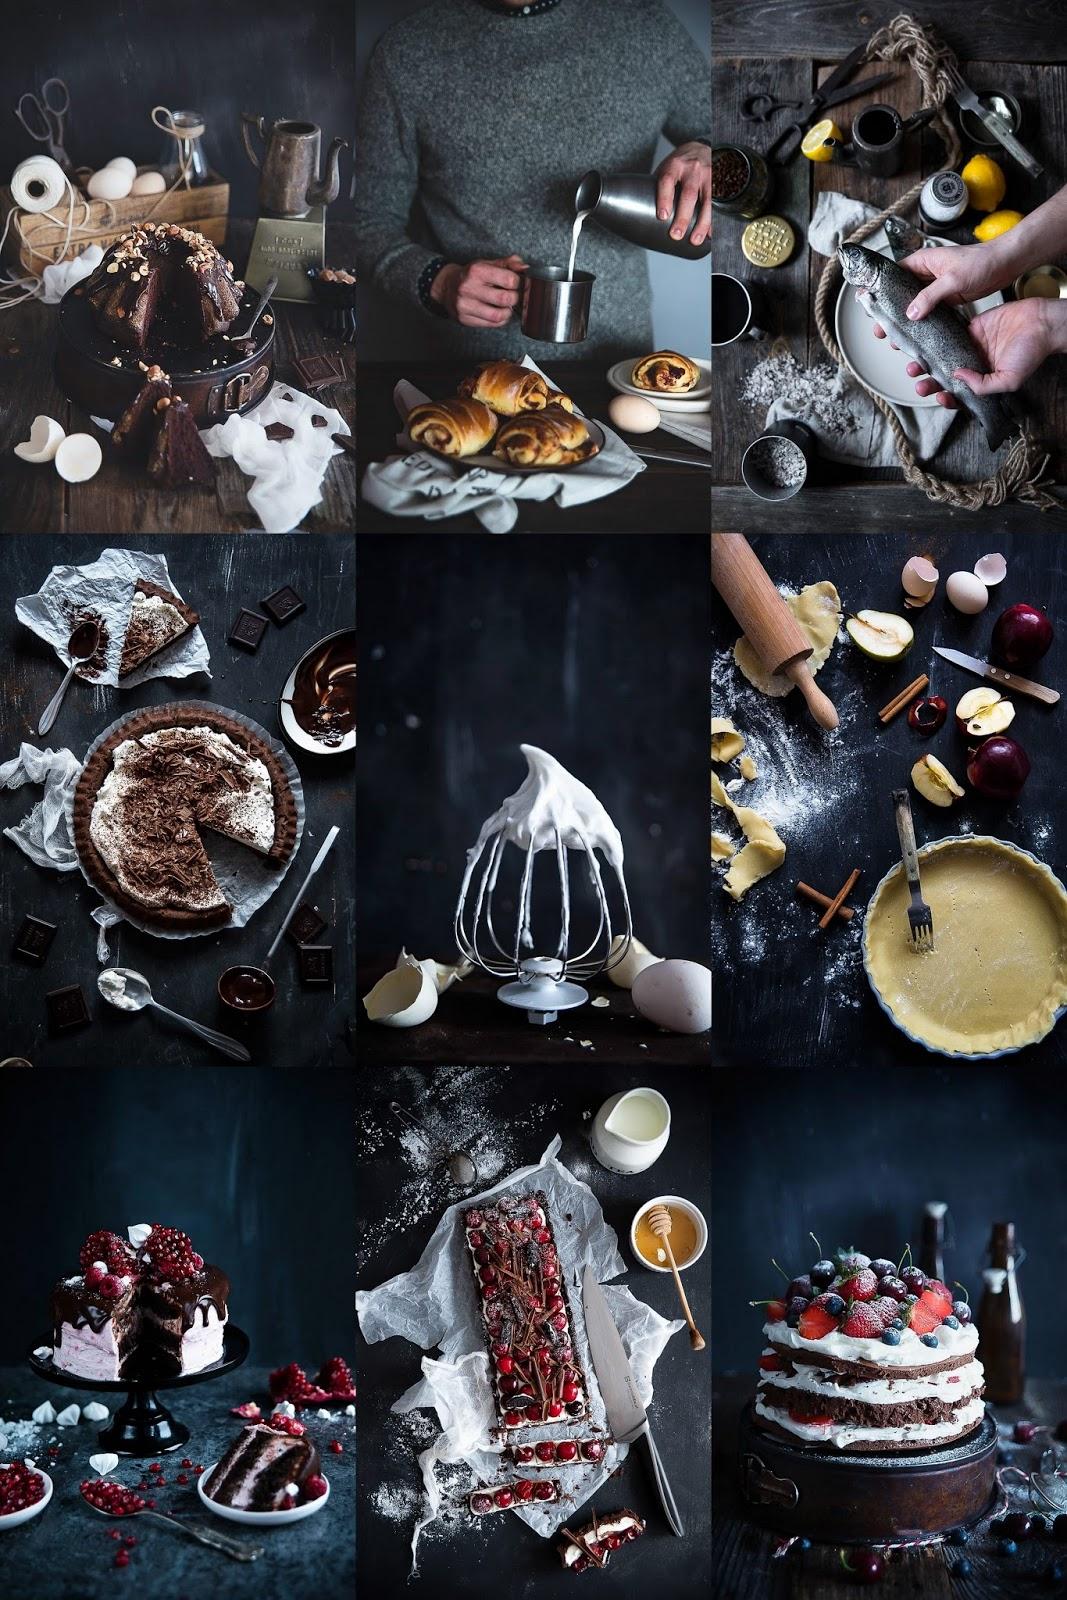 Kulisy fotografii kulinarnej: Jak robi zdjęcia Karolina z bloga Picante Jalapeno